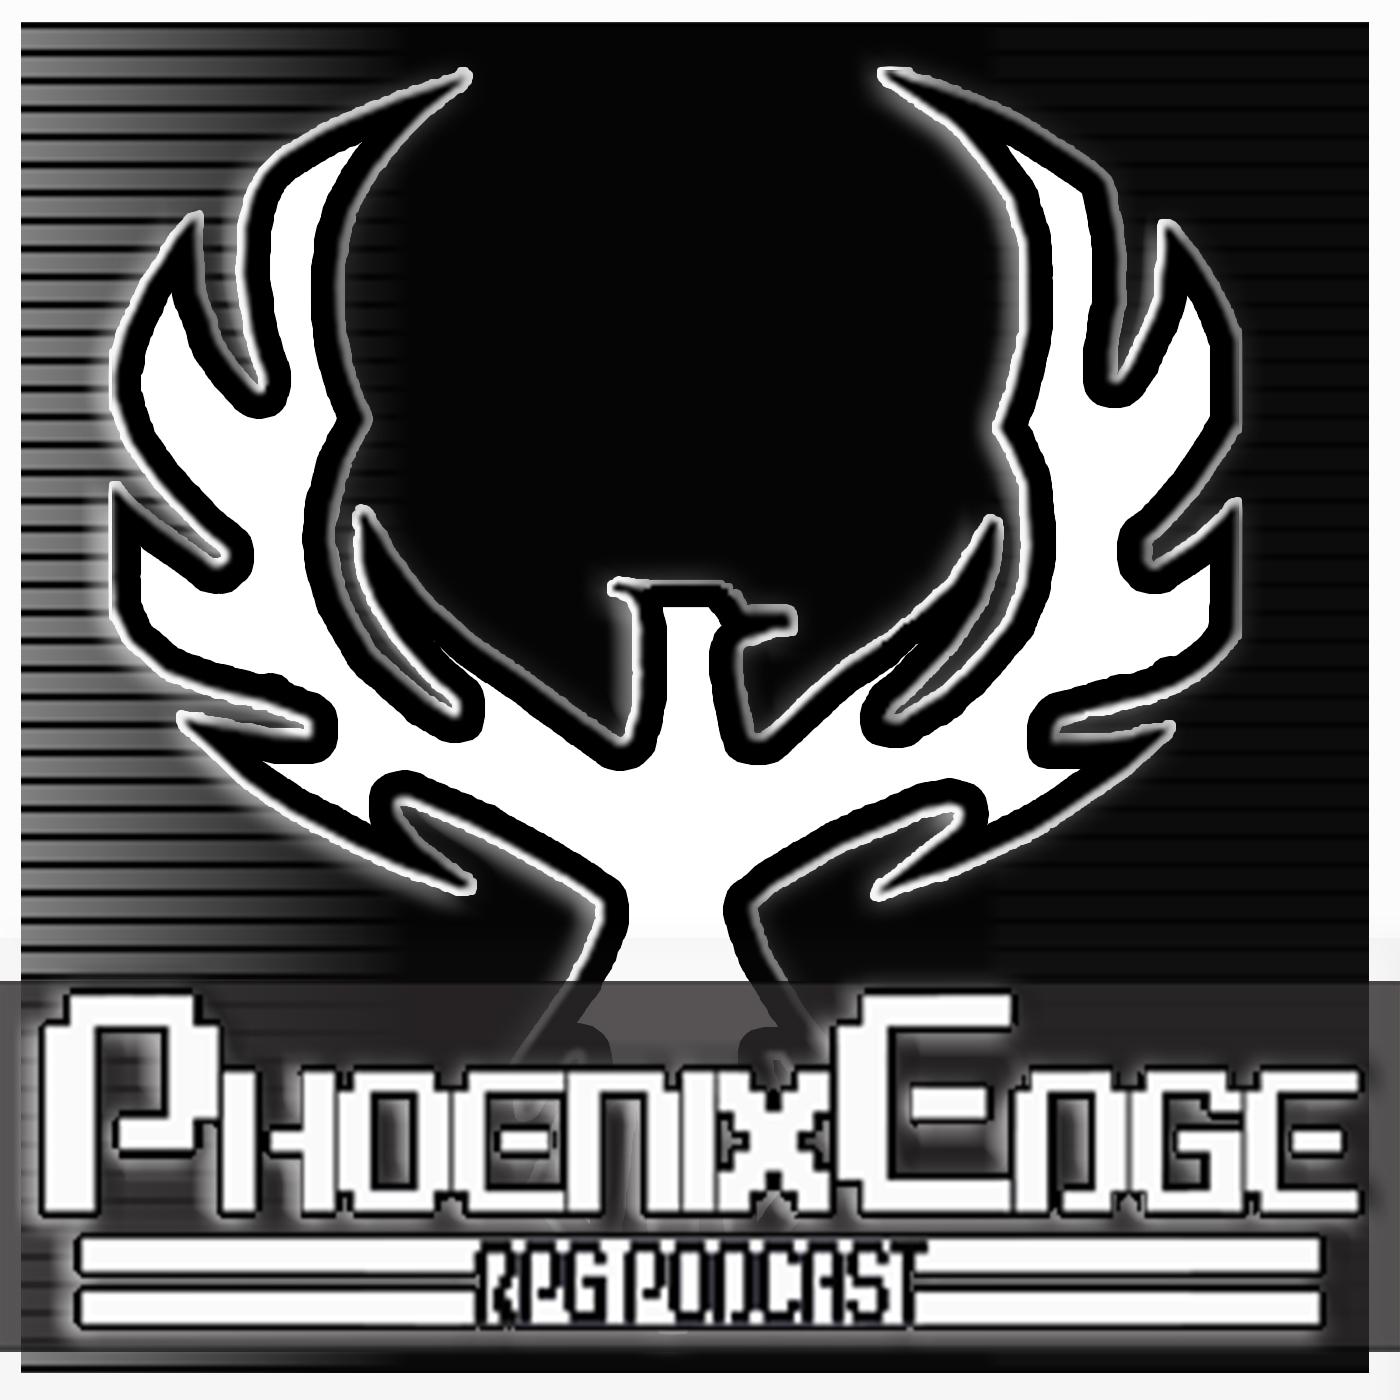 Phoenix Edge RPG Podcast show art